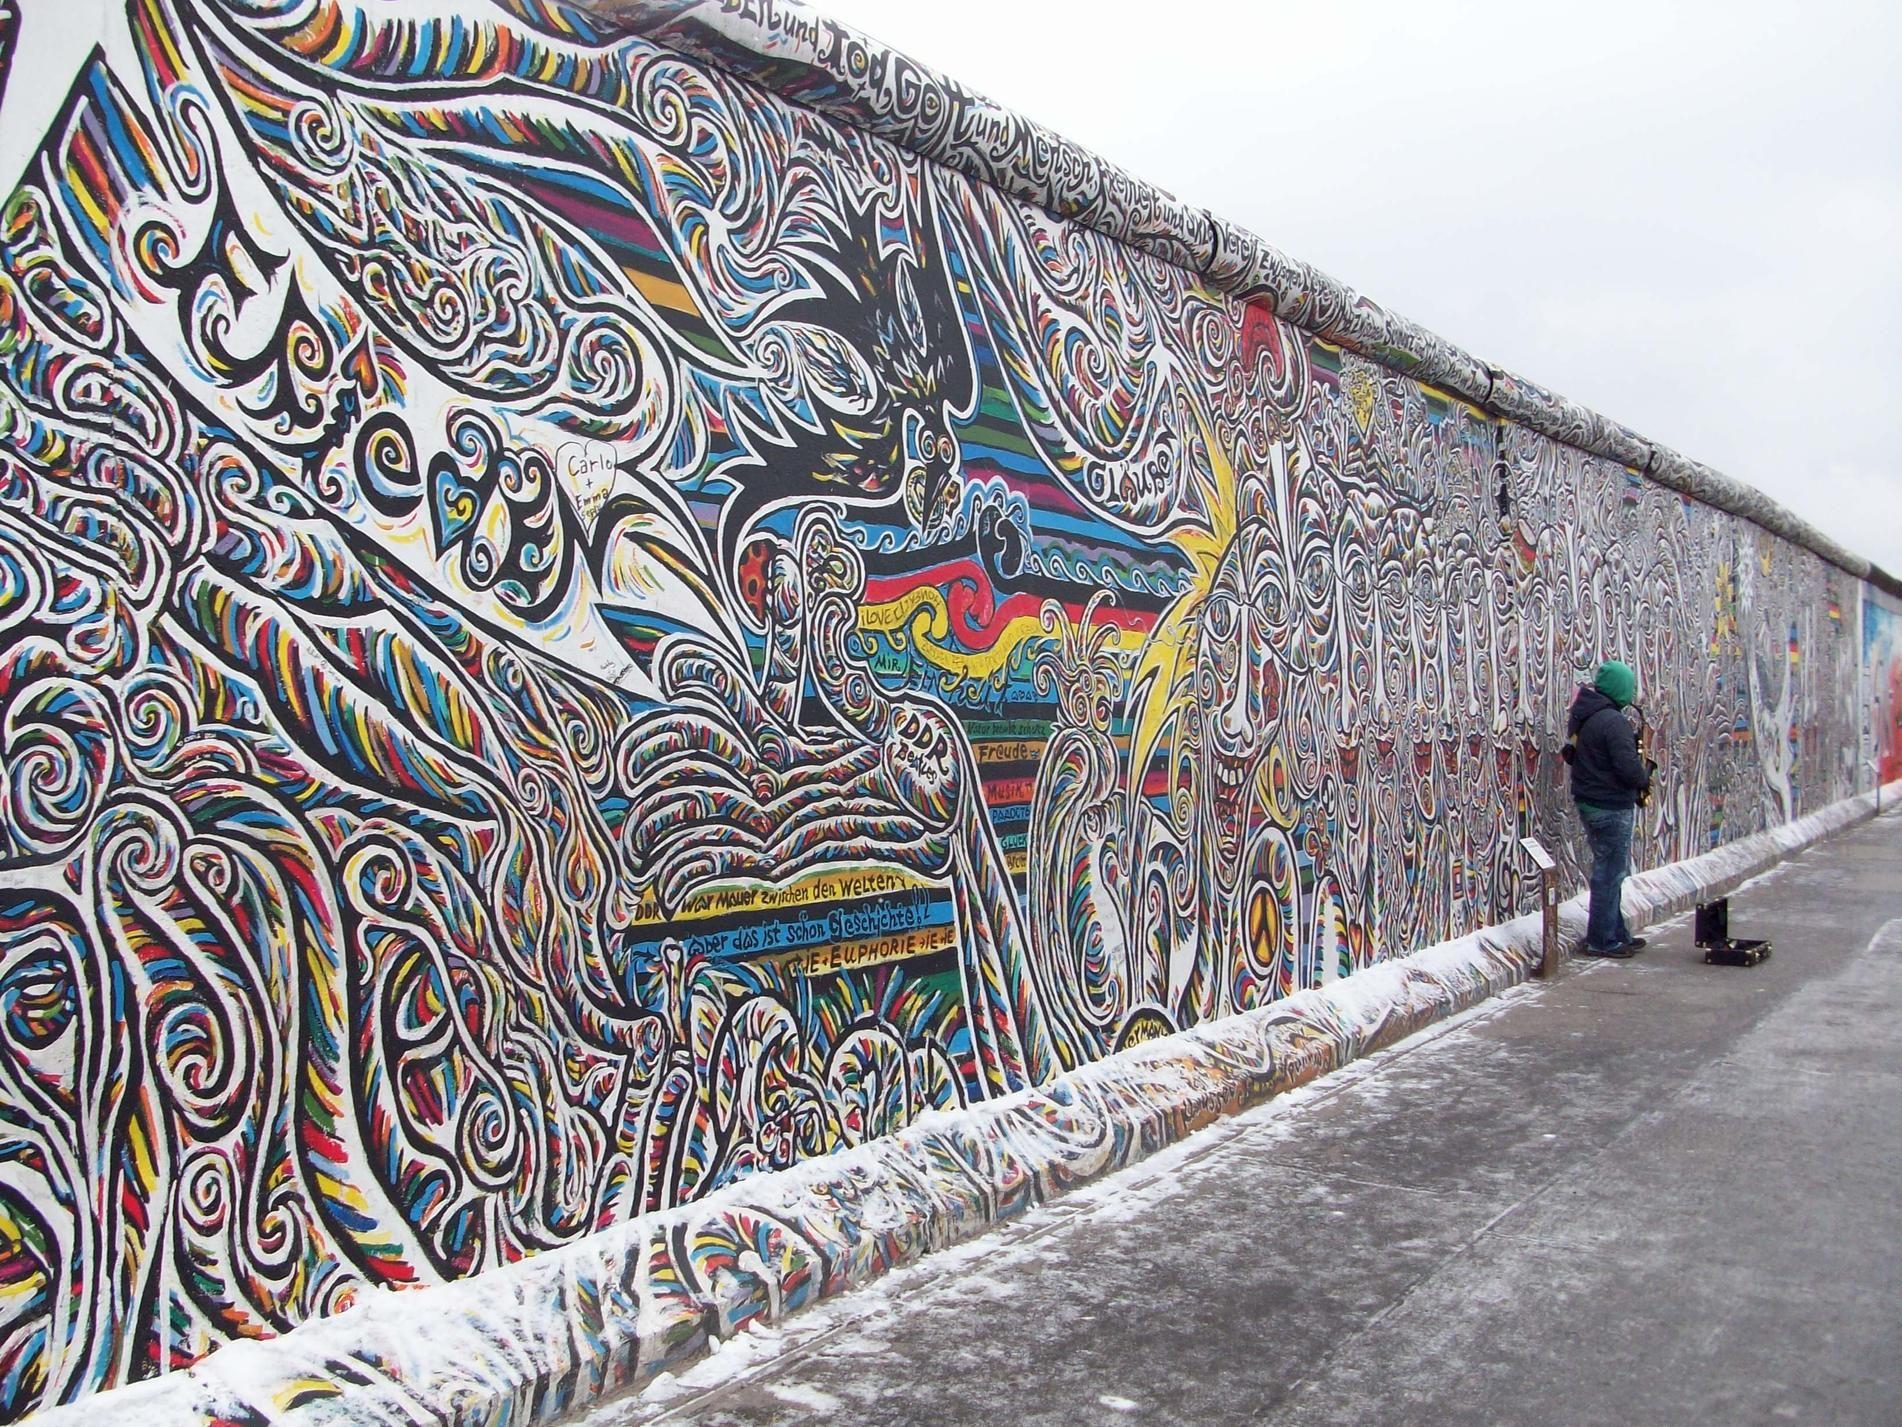 Graffiti wall pictures - Berlin Wall Graffiti